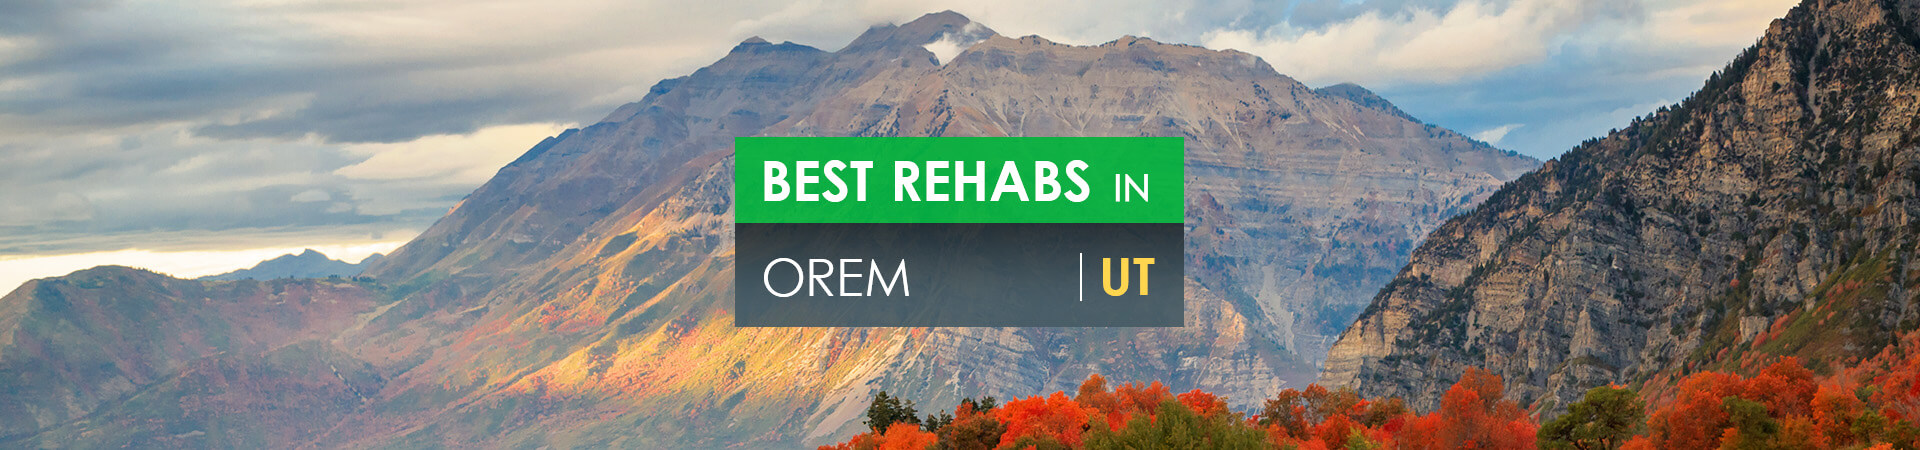 Best rehabs in Orem, UT